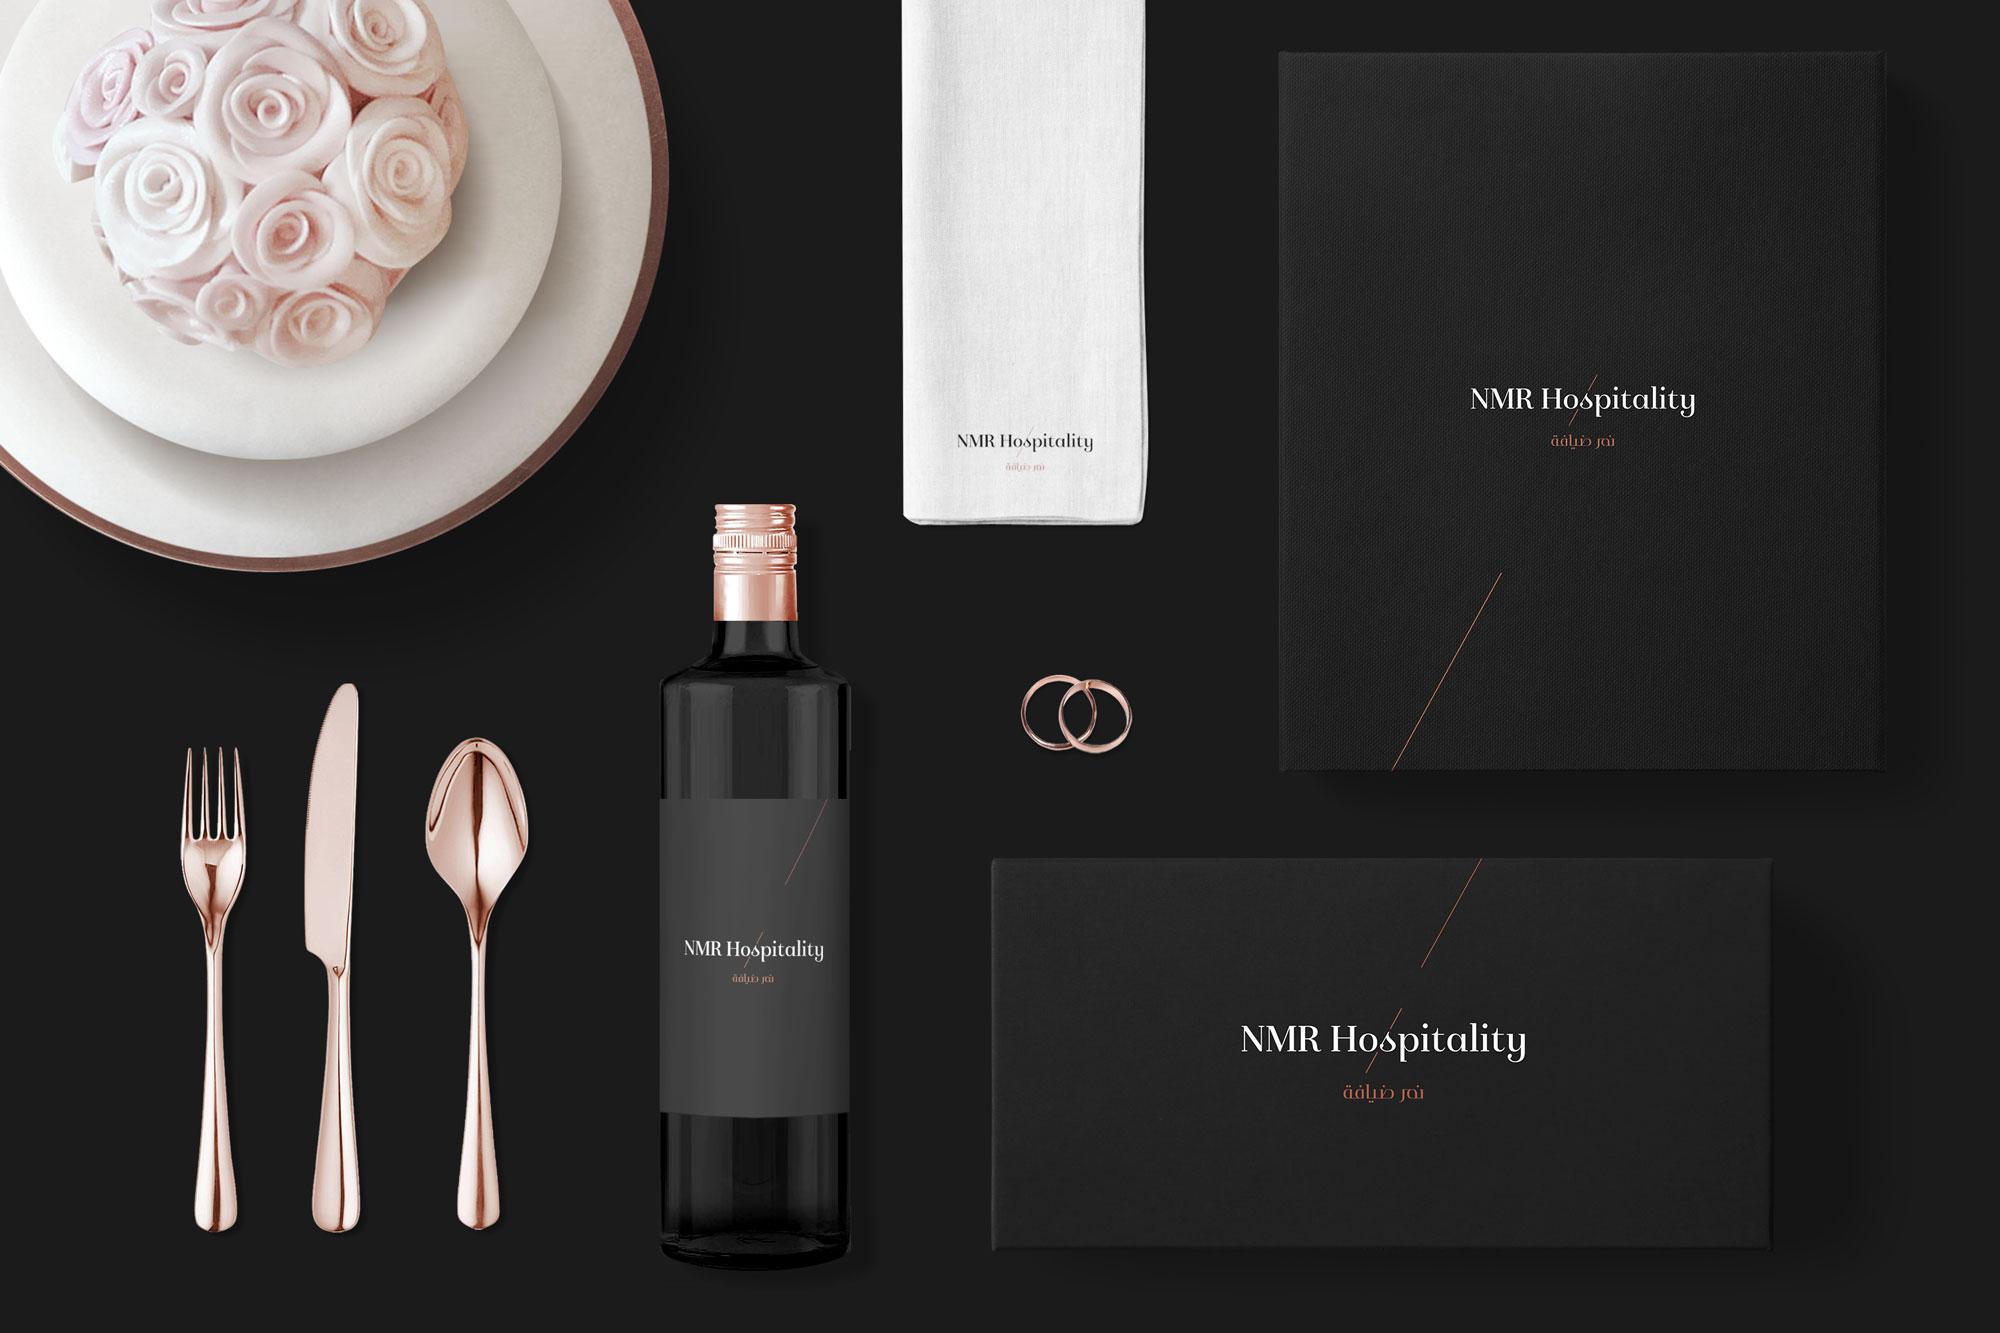 NMR Hospitality